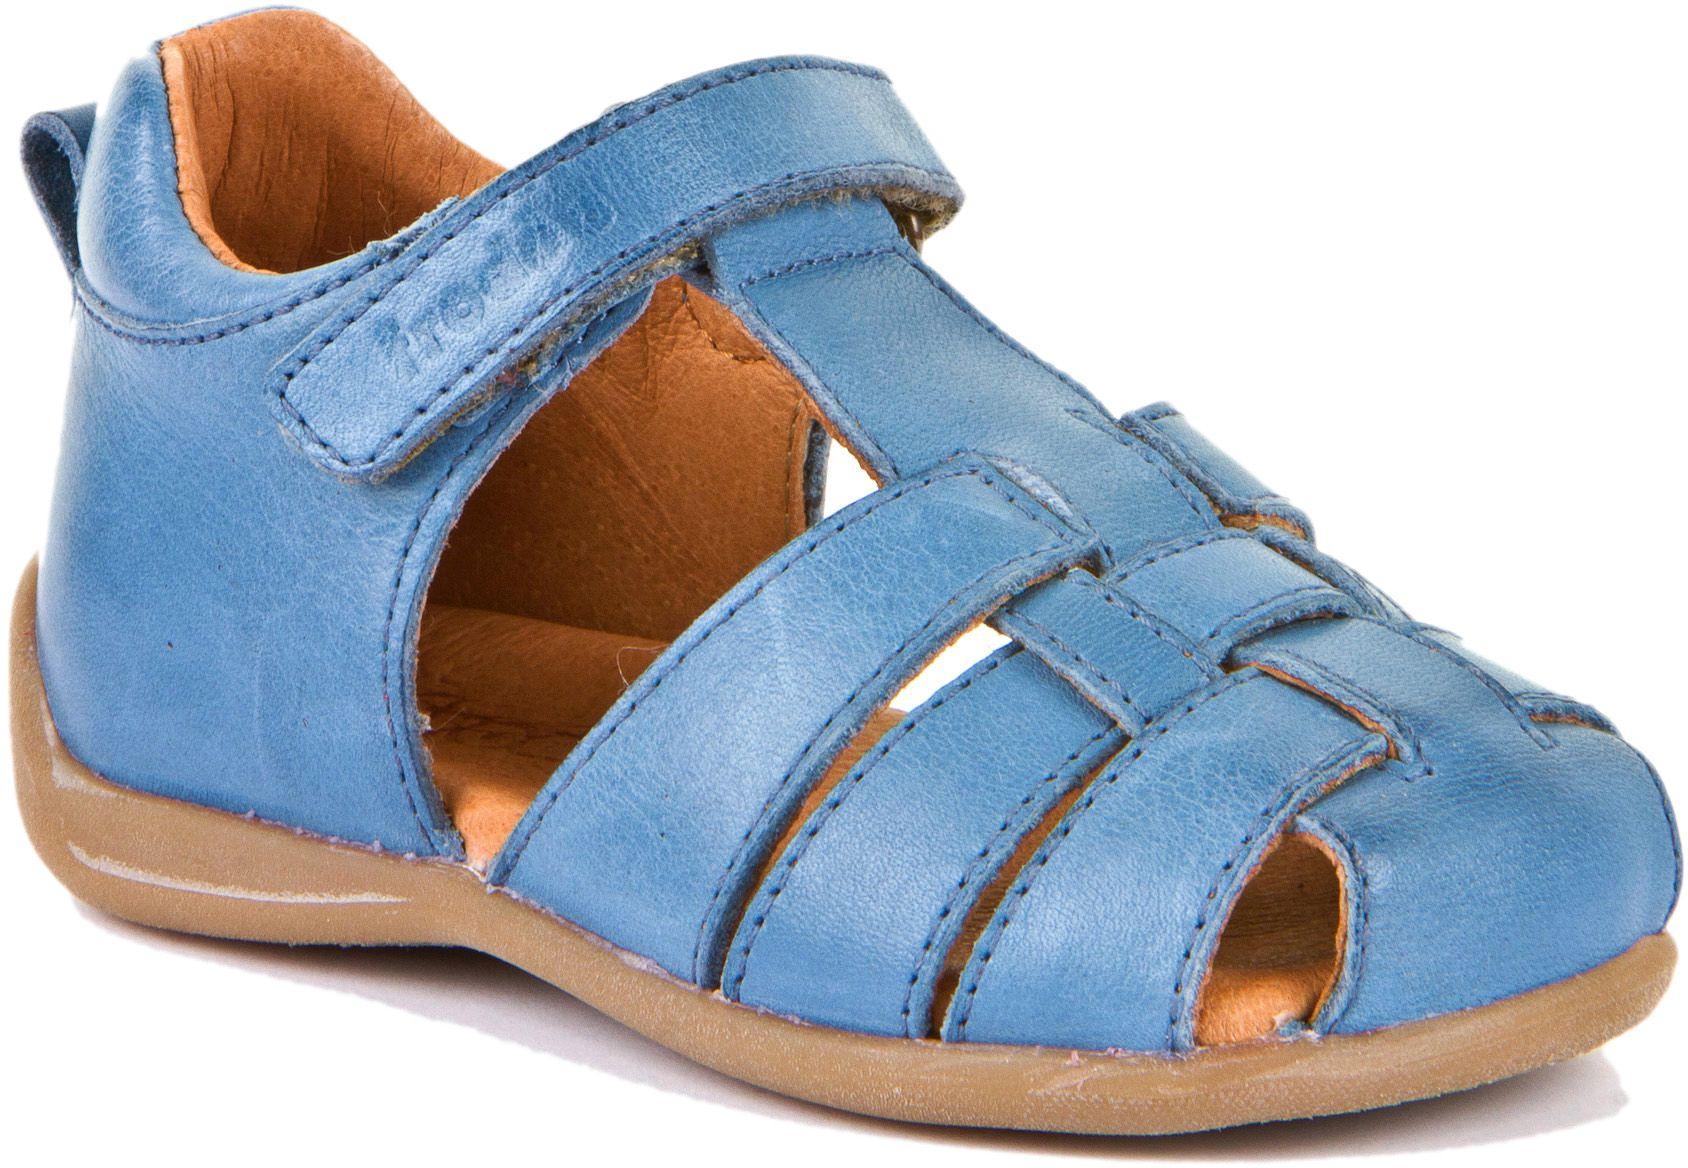 Froddo Lauflerner Sandale Jeans